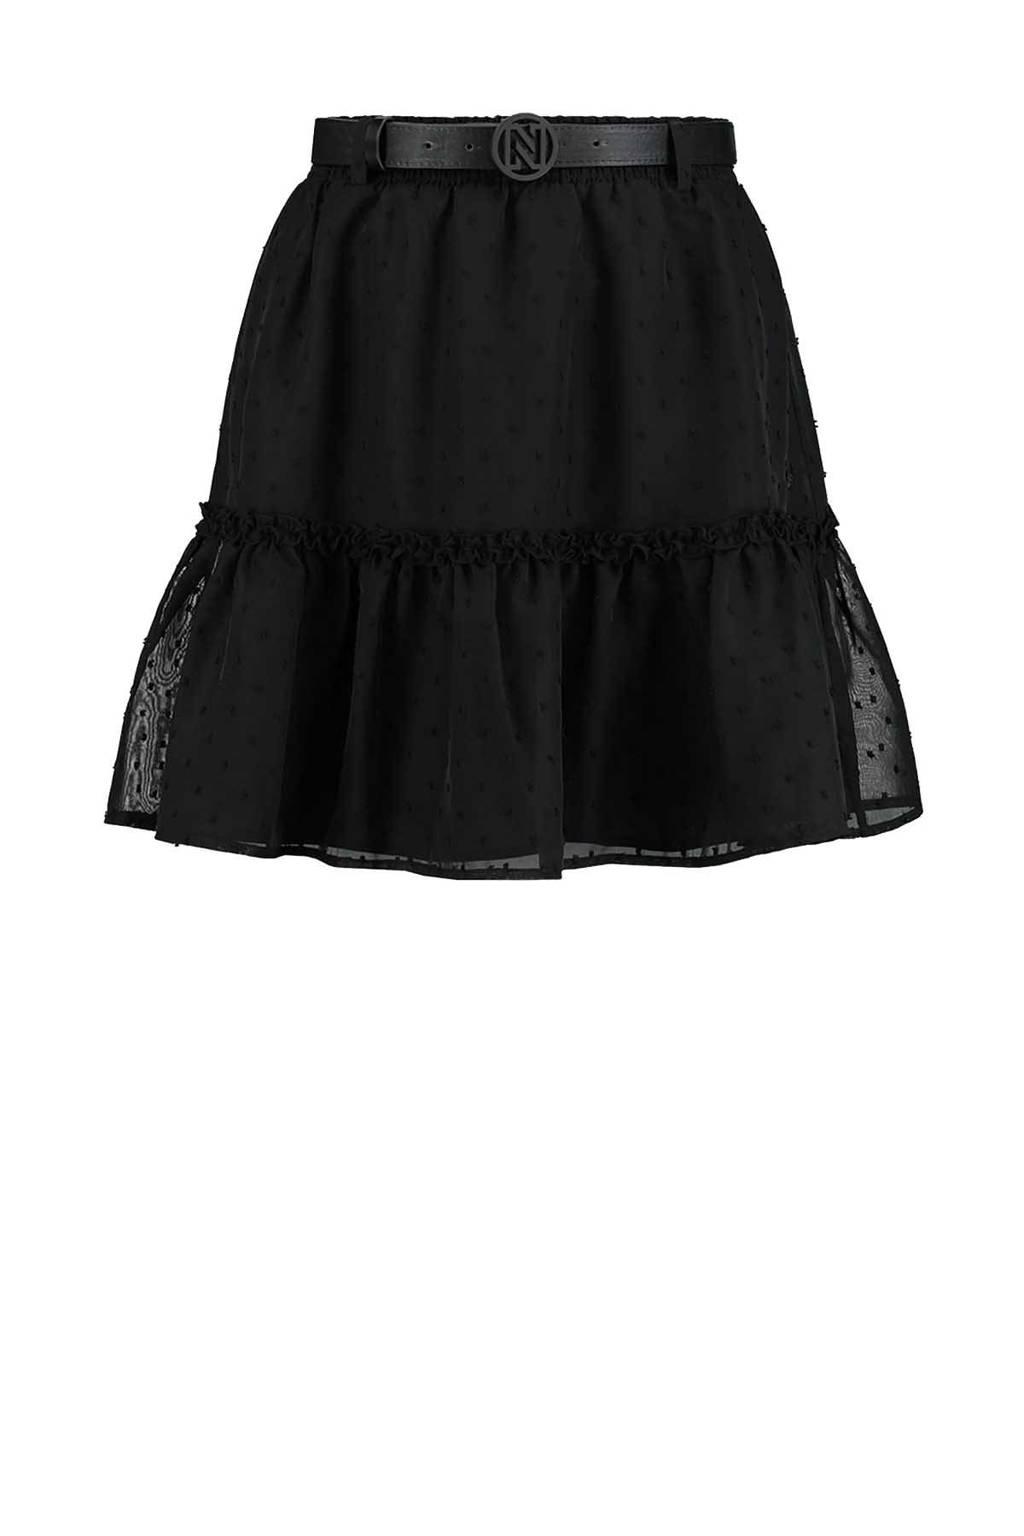 NIKKIE semi-transparante mini rok Fancy Dot met stippen en ruches zwart, Zwart